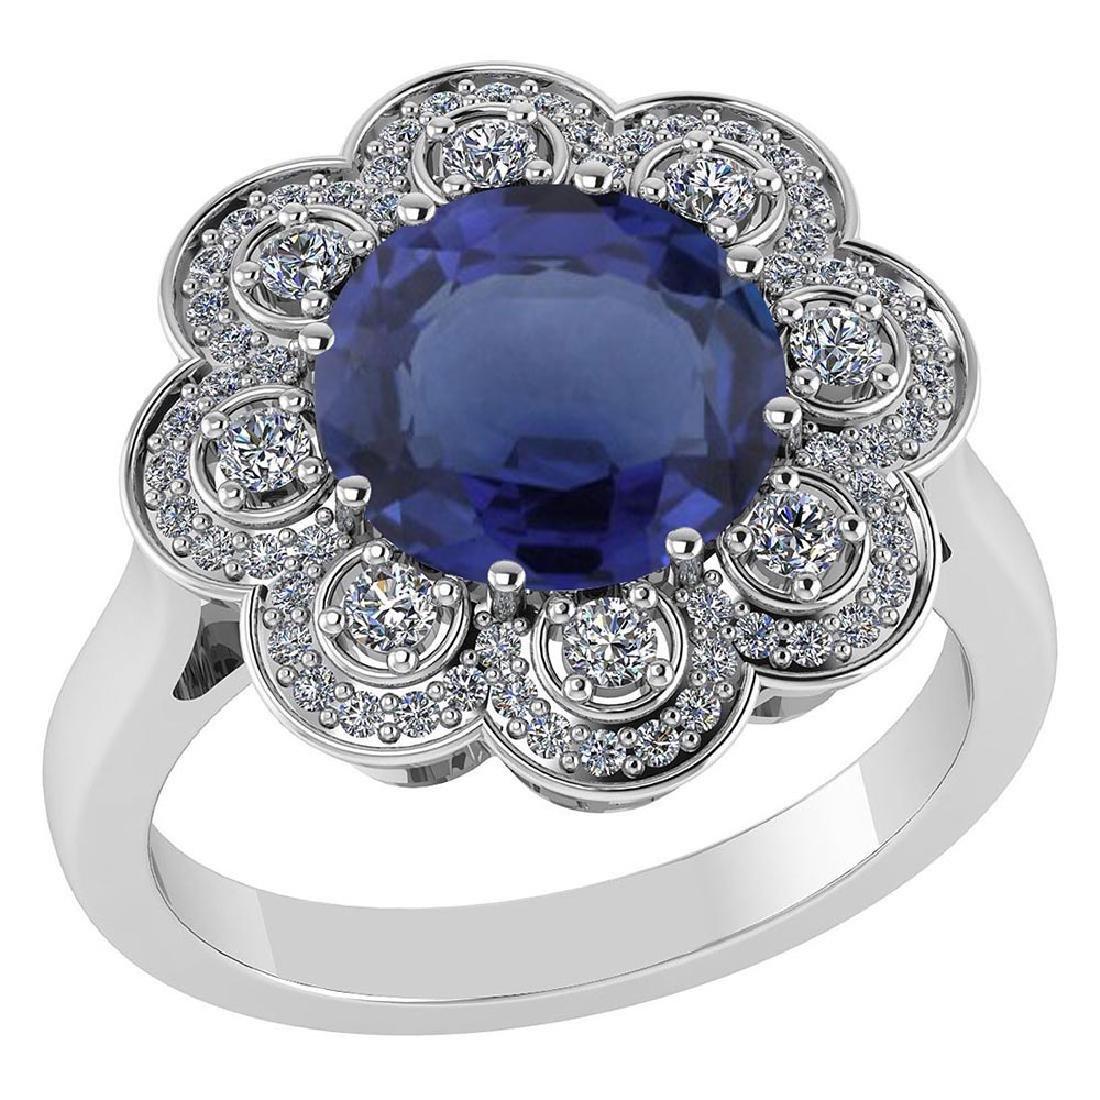 Certified 4.42 CTW Genuine Blue Sapphire And Diamond 14